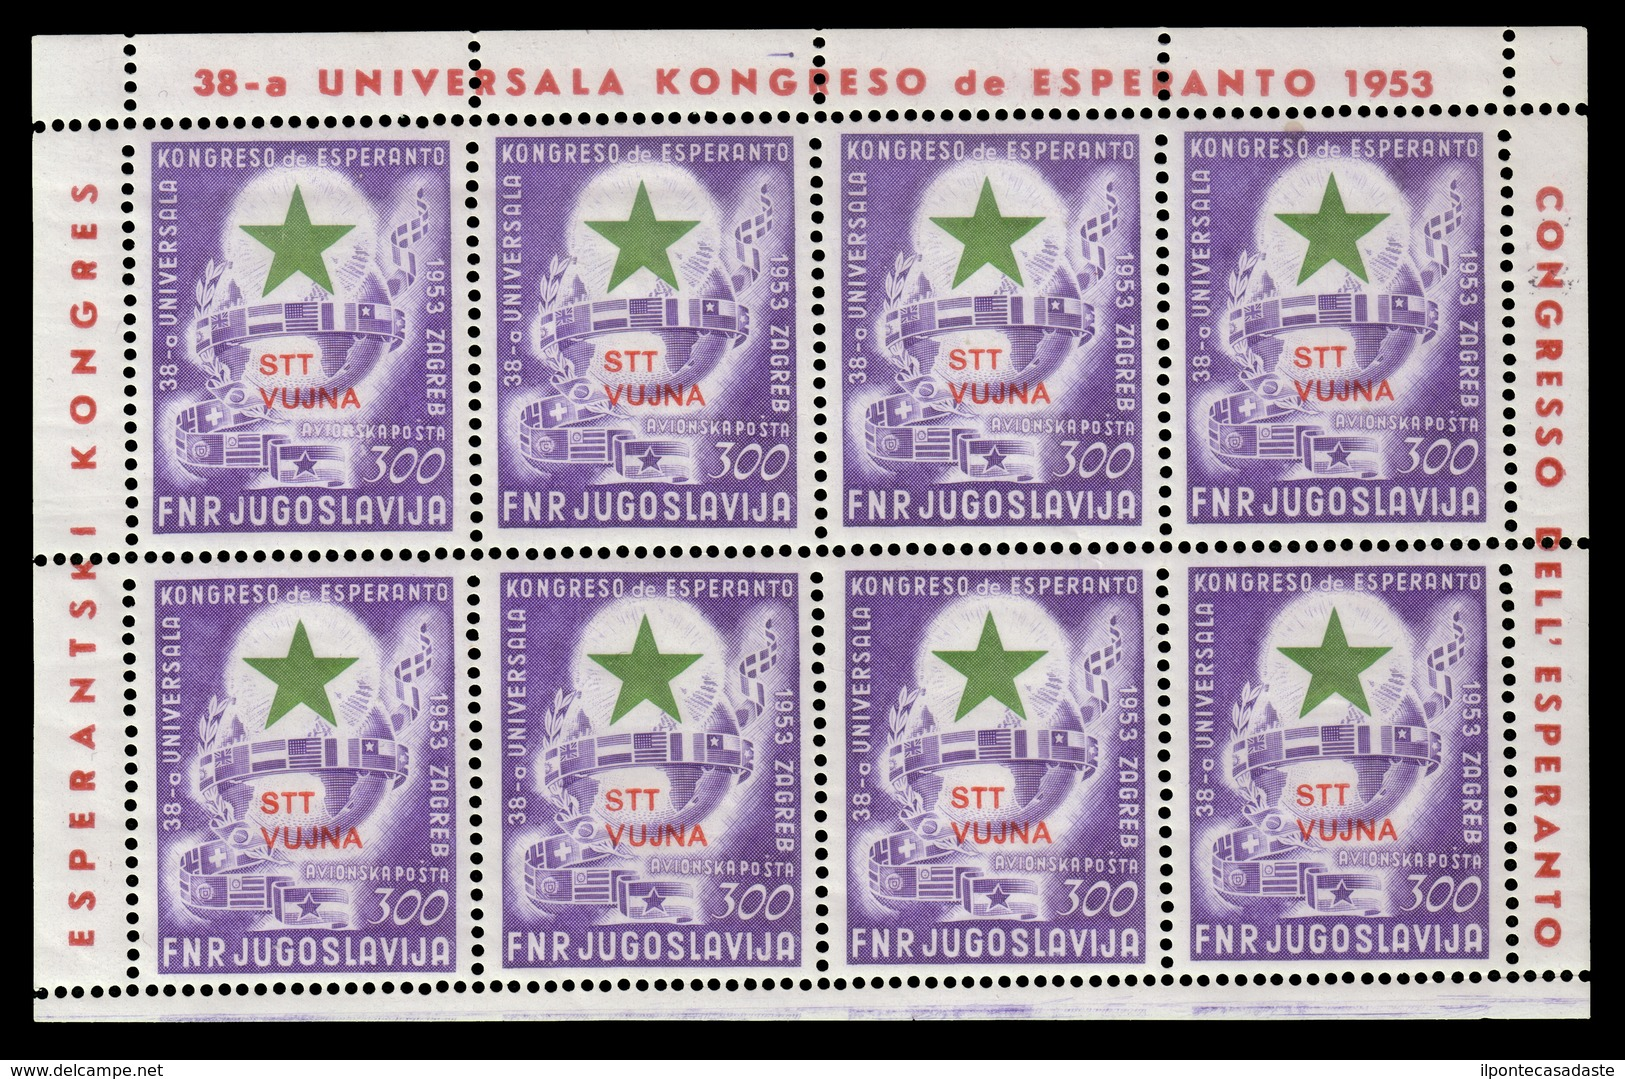 "MNH ) TRIESTE B 1953 | Foglietto Posta Aerea. 300d. Lilla E Verde ""Esperanto"" Soprastampato ""STT / VUJNA"" - Trieste"